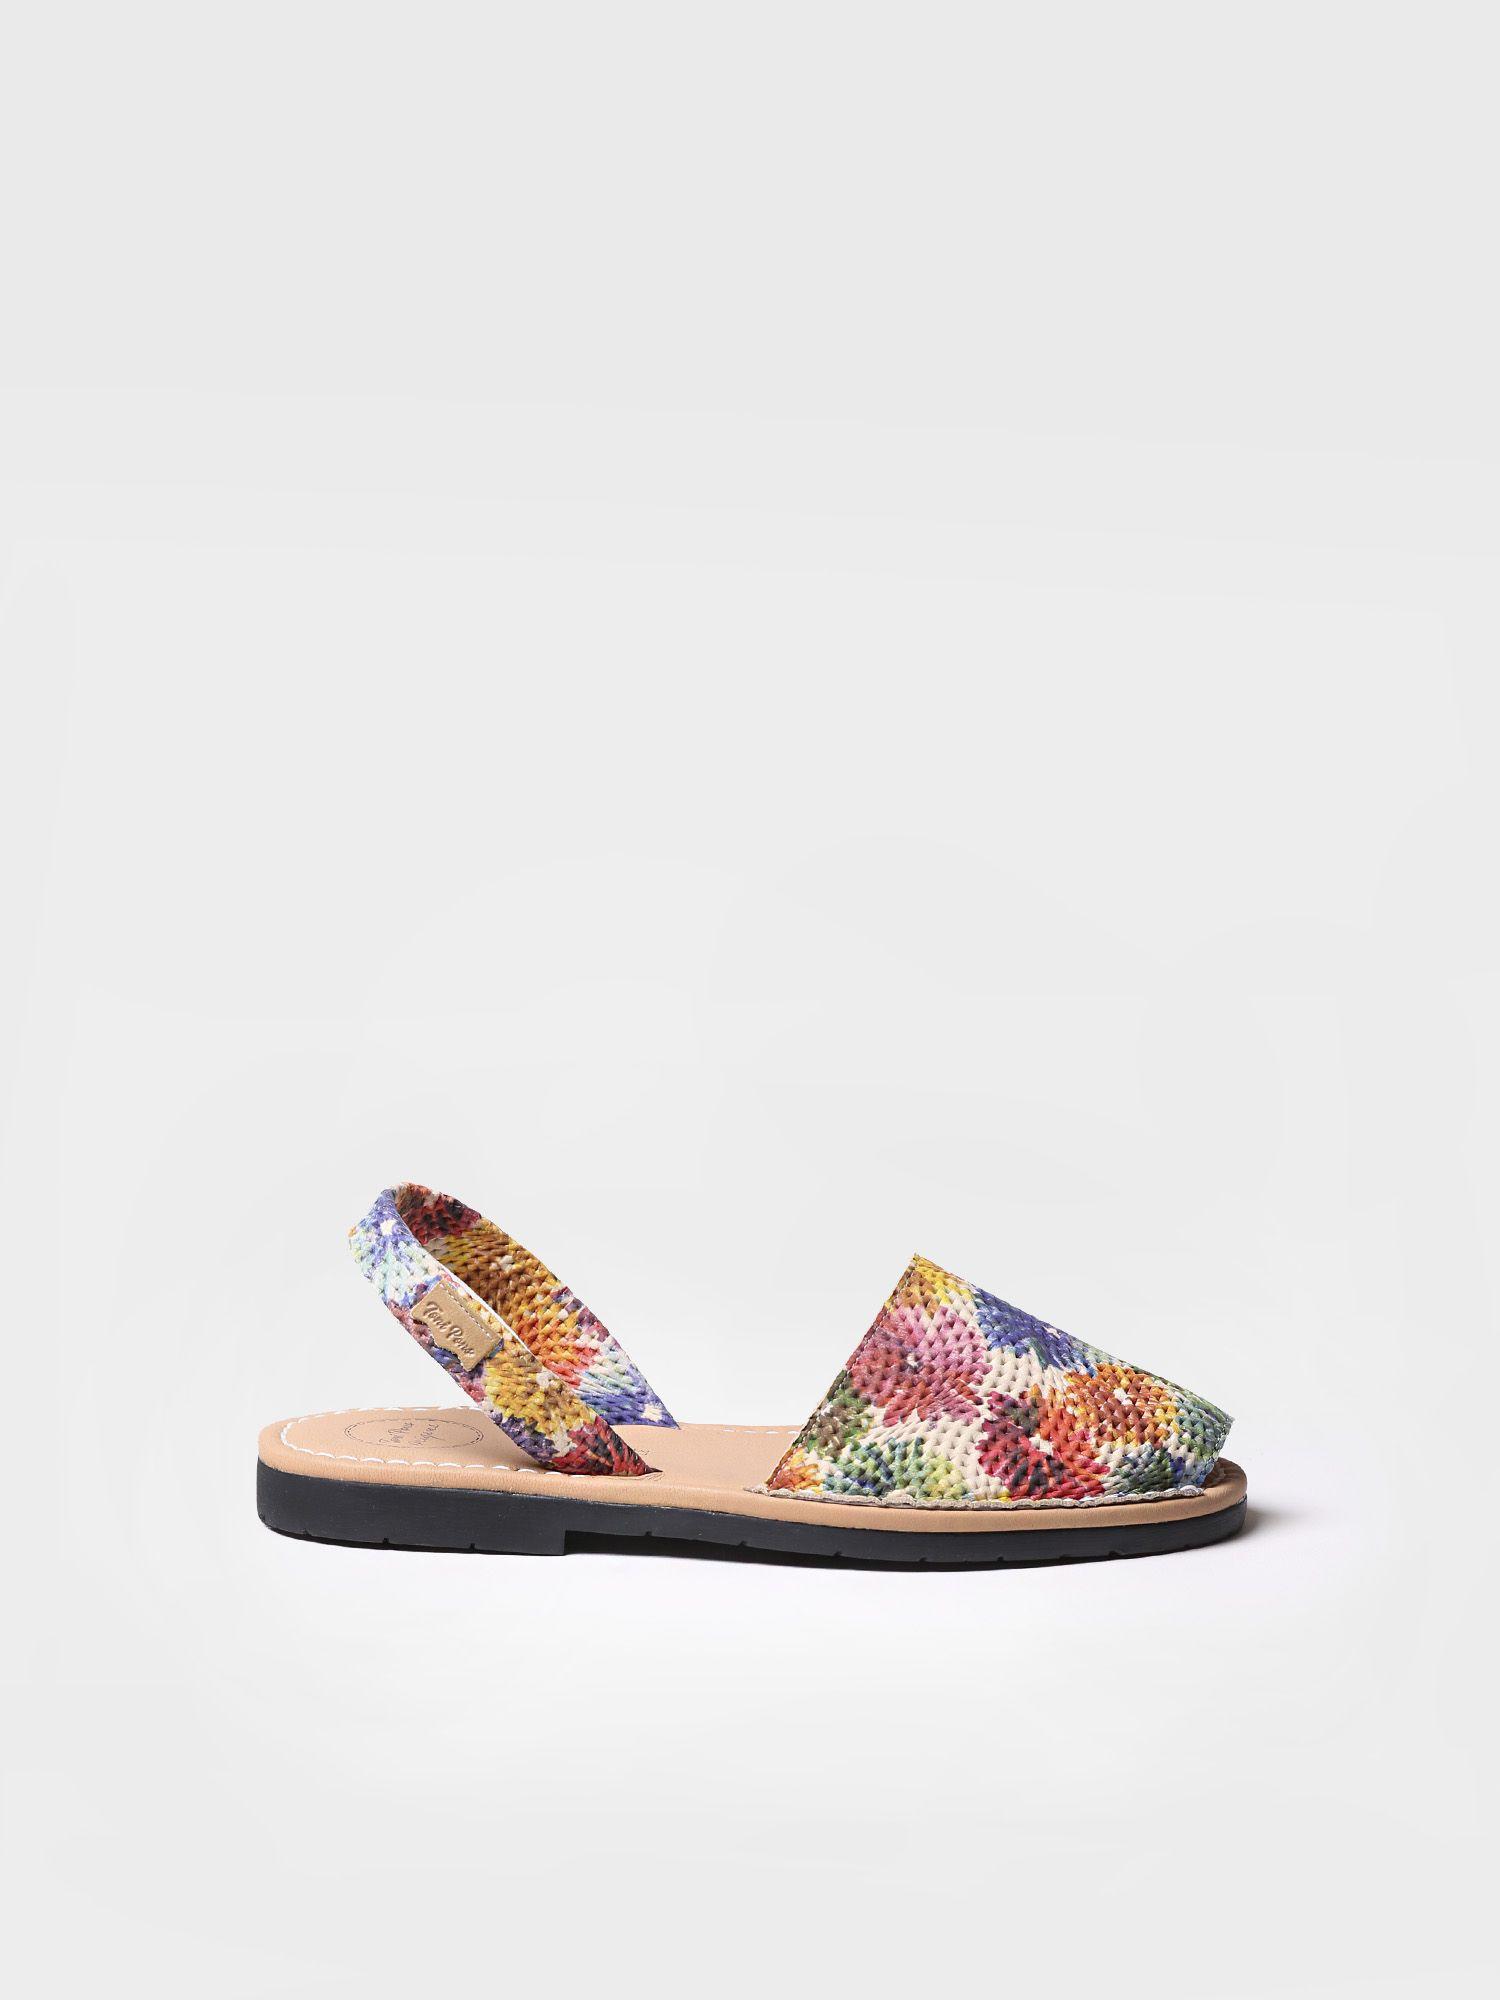 Leather menorquine sandal - MAO-DM